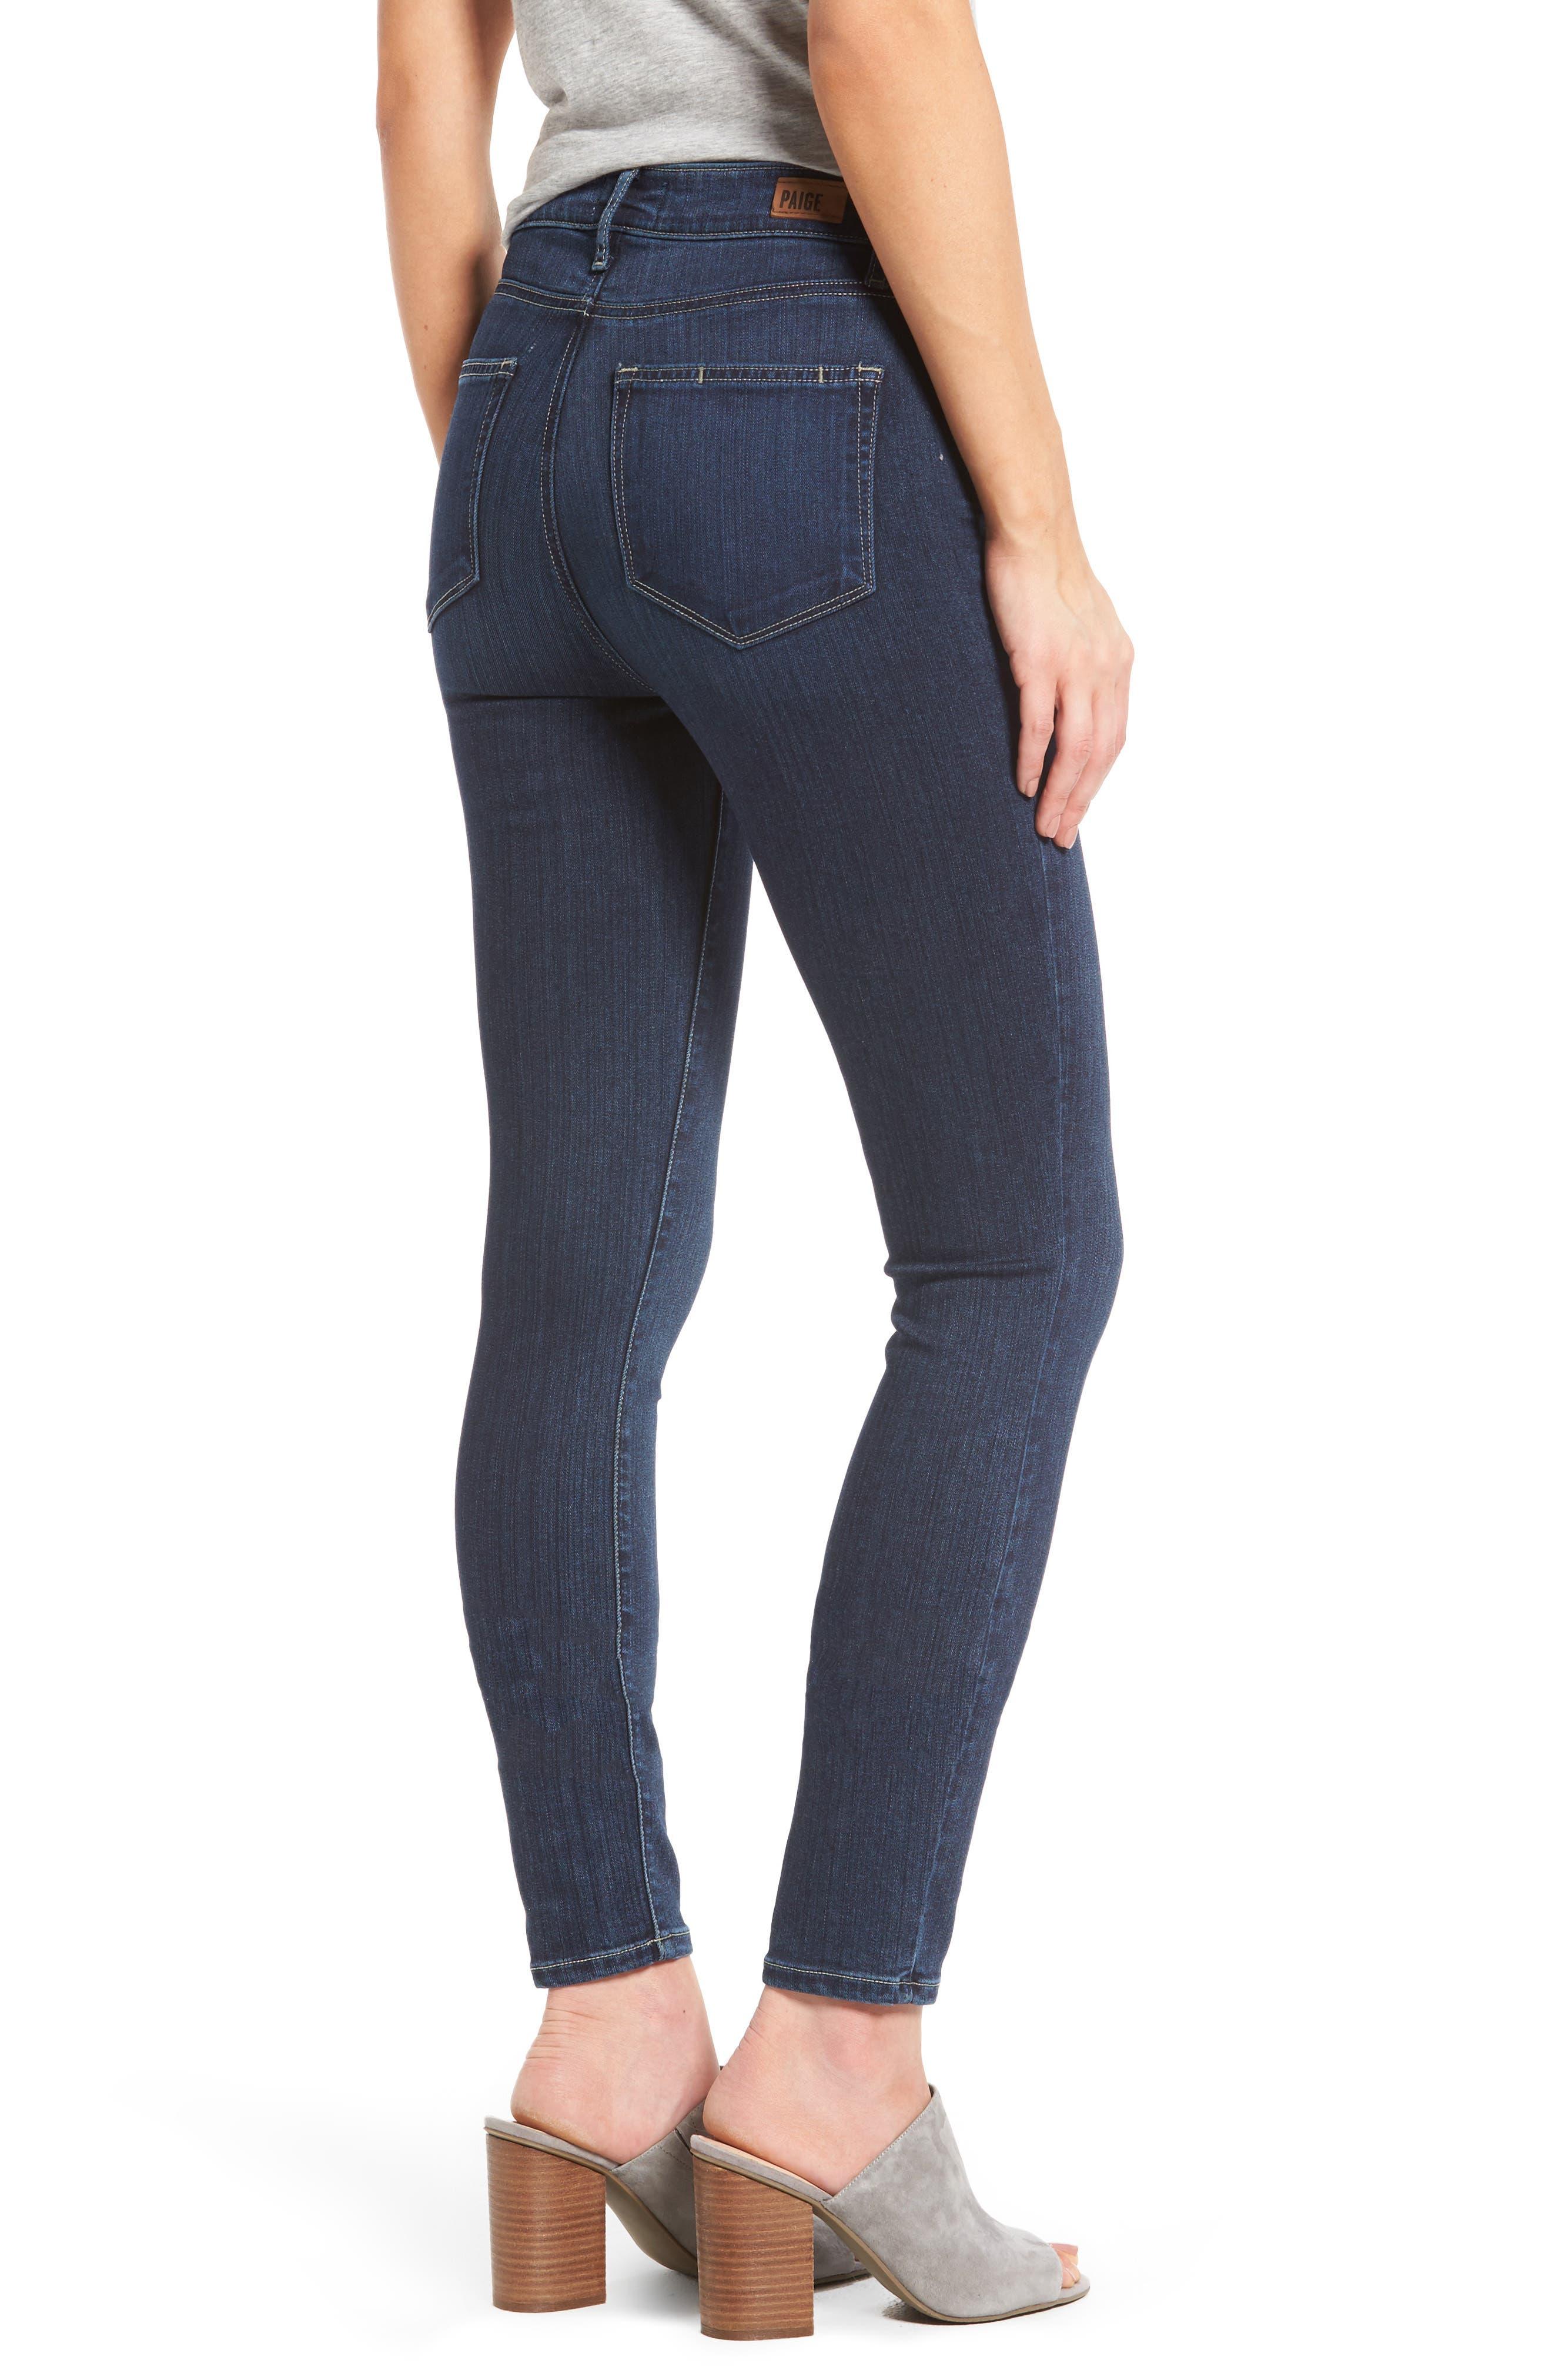 Transcend - Hoxton High Waist Ankle Skinny Jeans,                             Alternate thumbnail 2, color,                             400